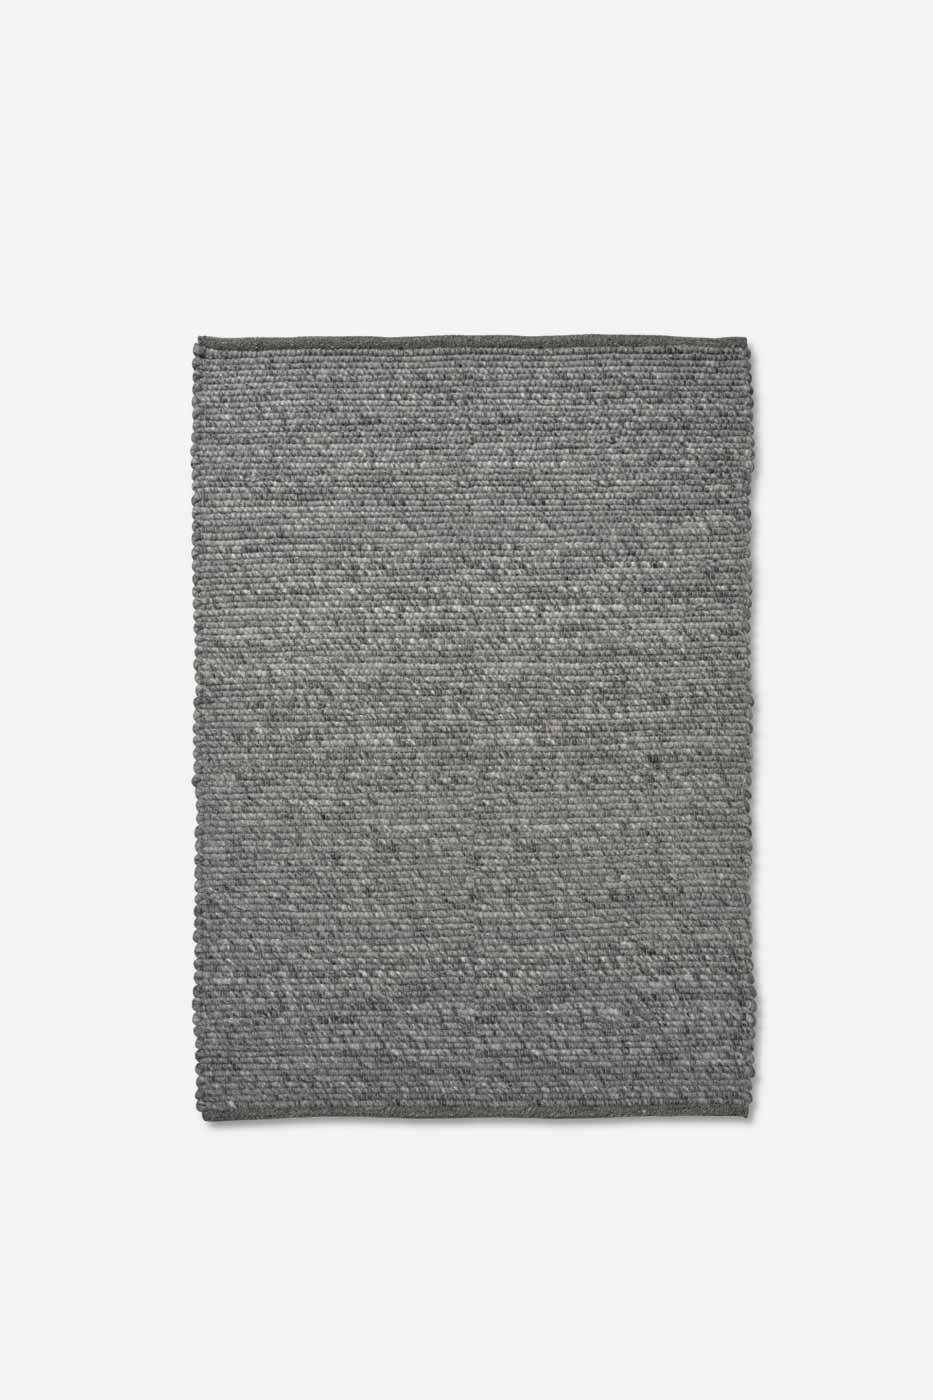 Matta Merino 140x200cm Granit